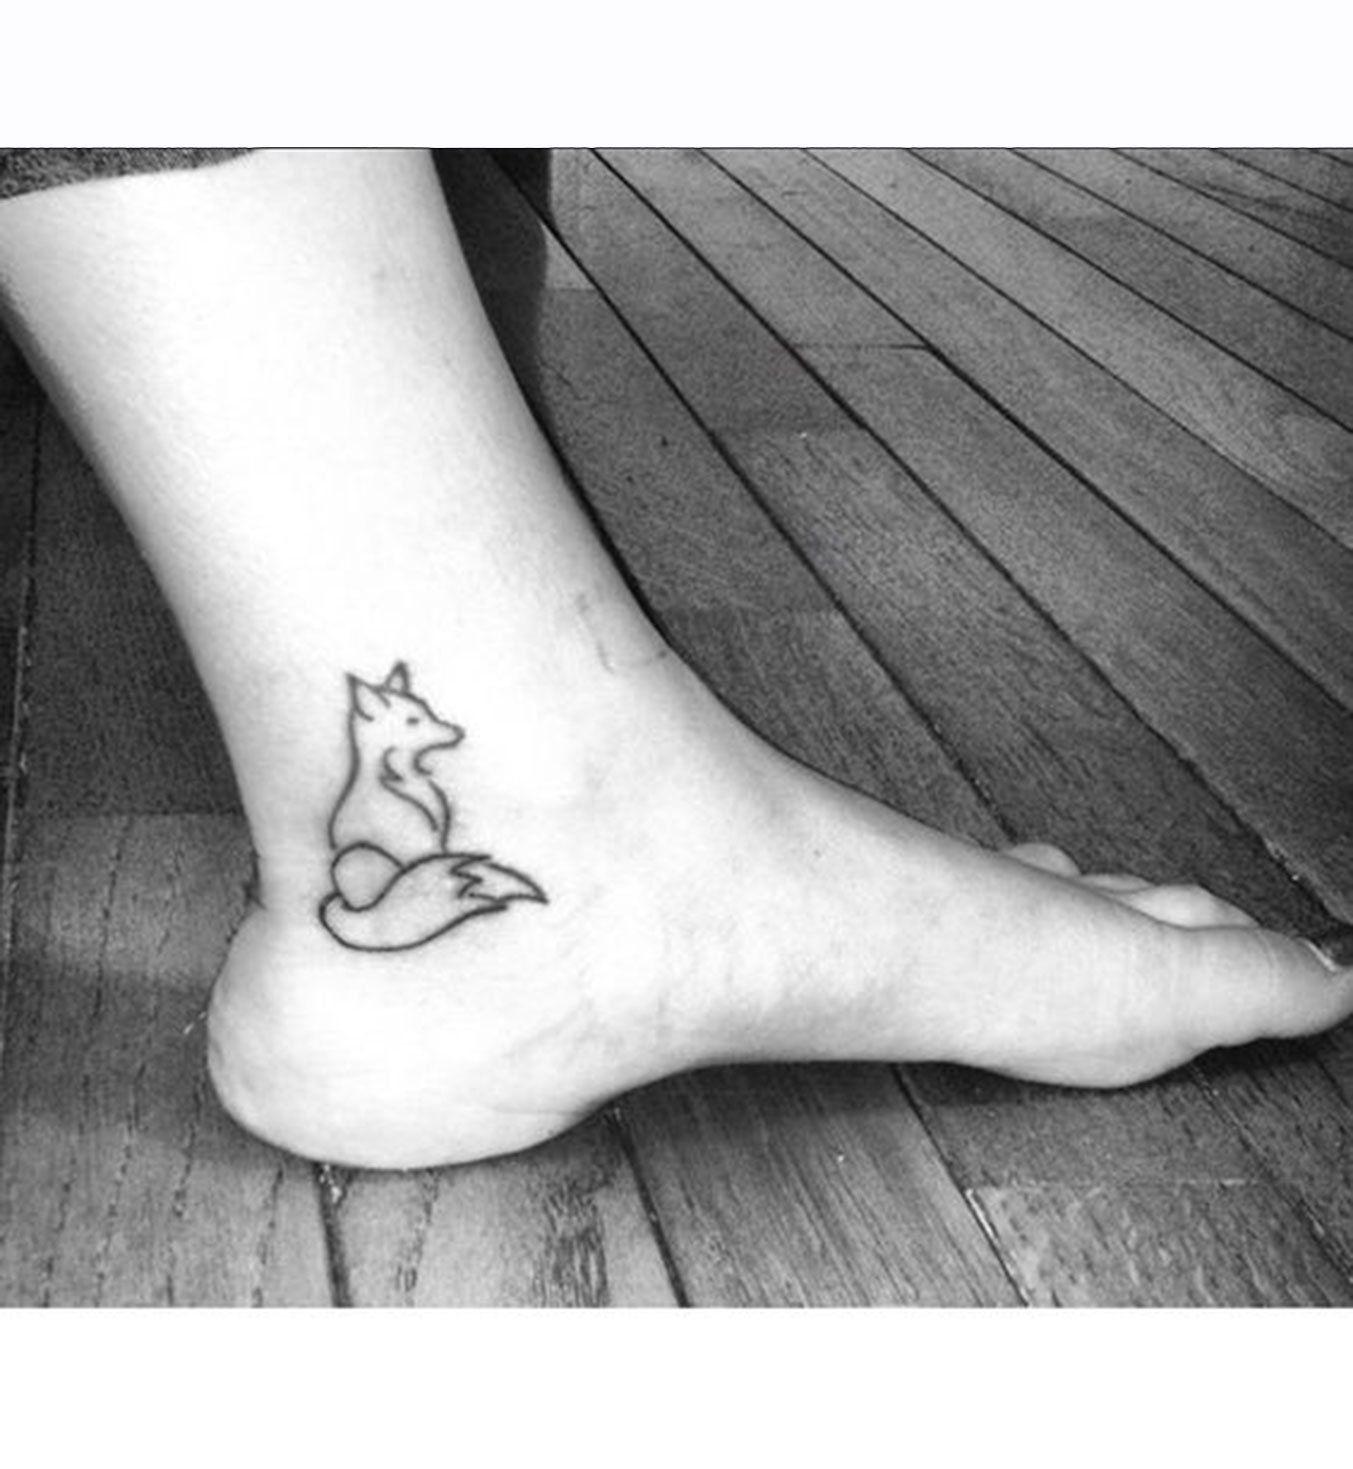 Tatouage Cheville Renard Tatoo Renard Pinterest Tattoos Fox